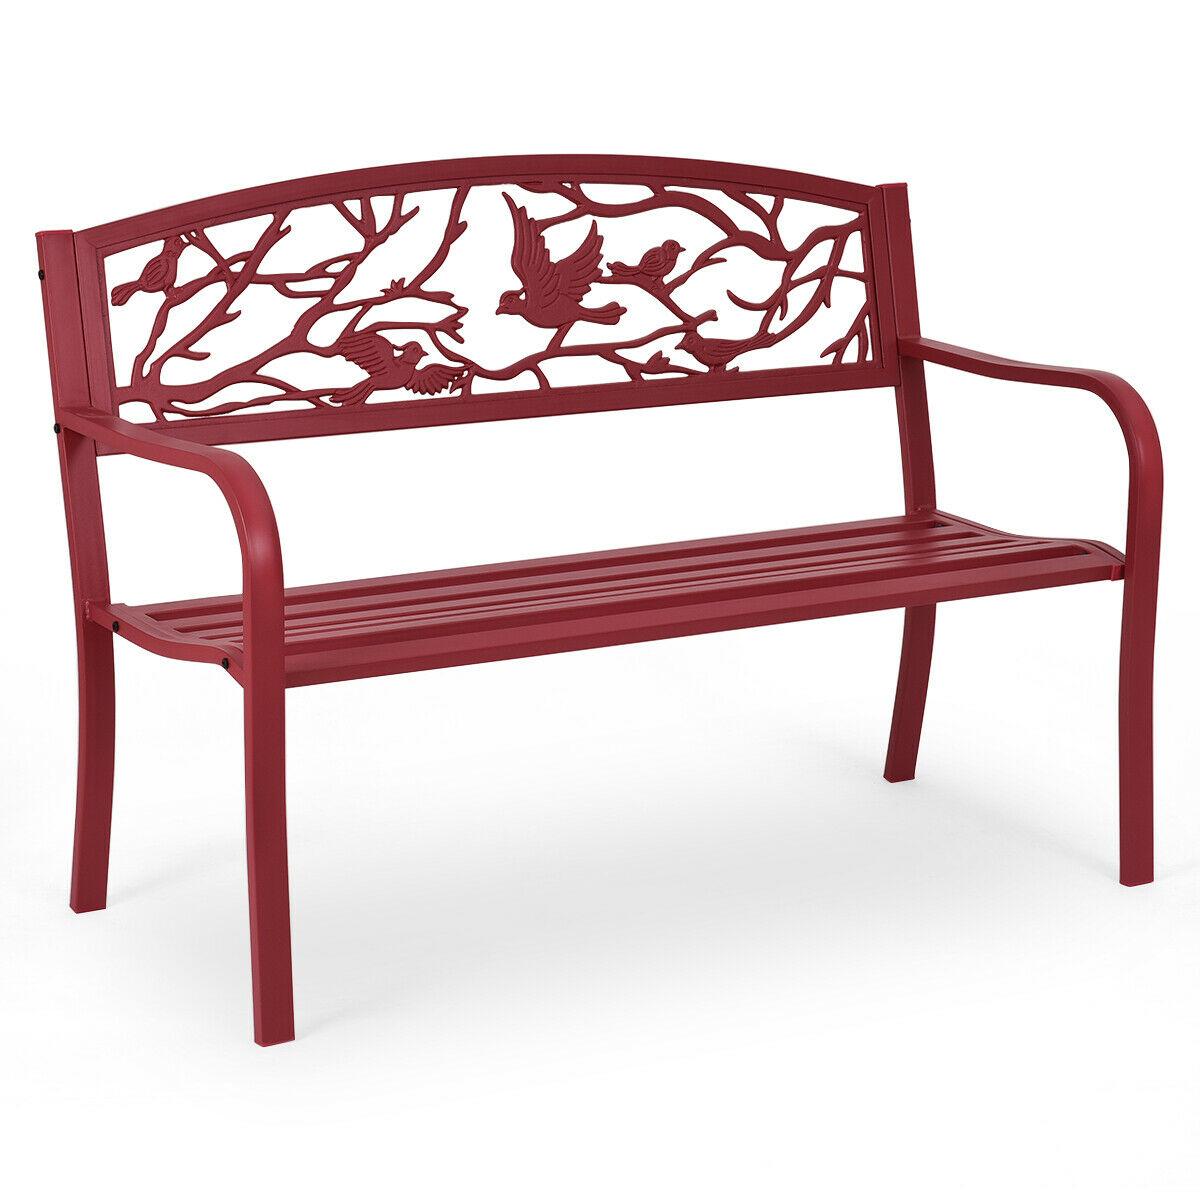 Costway-مقعد حديقة الفناء ، أثاث خارجي ، كرسي حديقة من الحديد الزهر ، أحمر